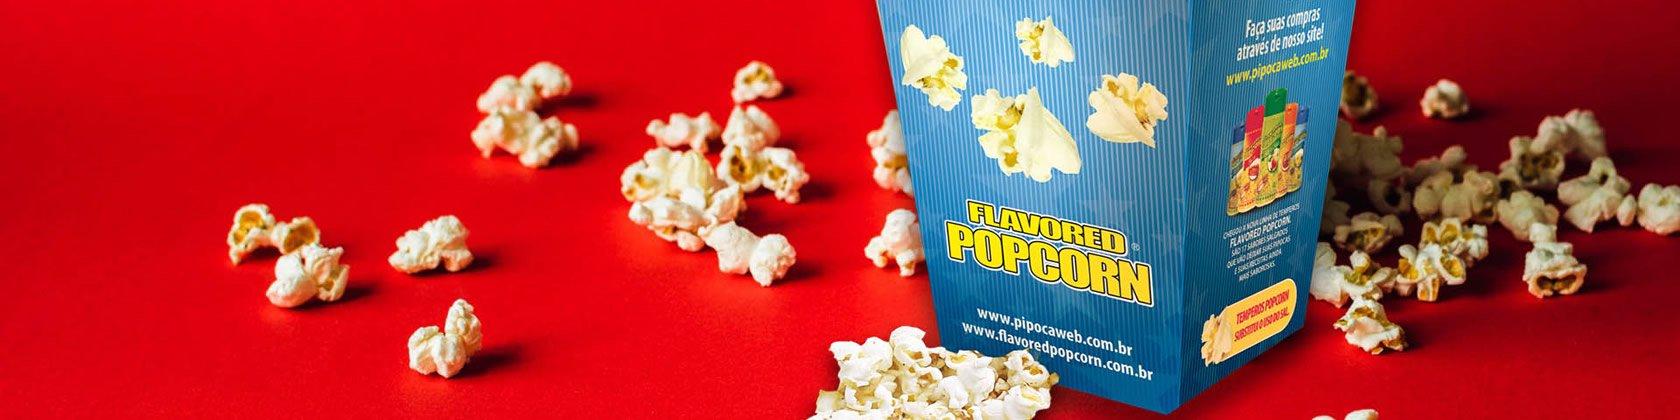 Flavored Popcorn - Pipocaweb